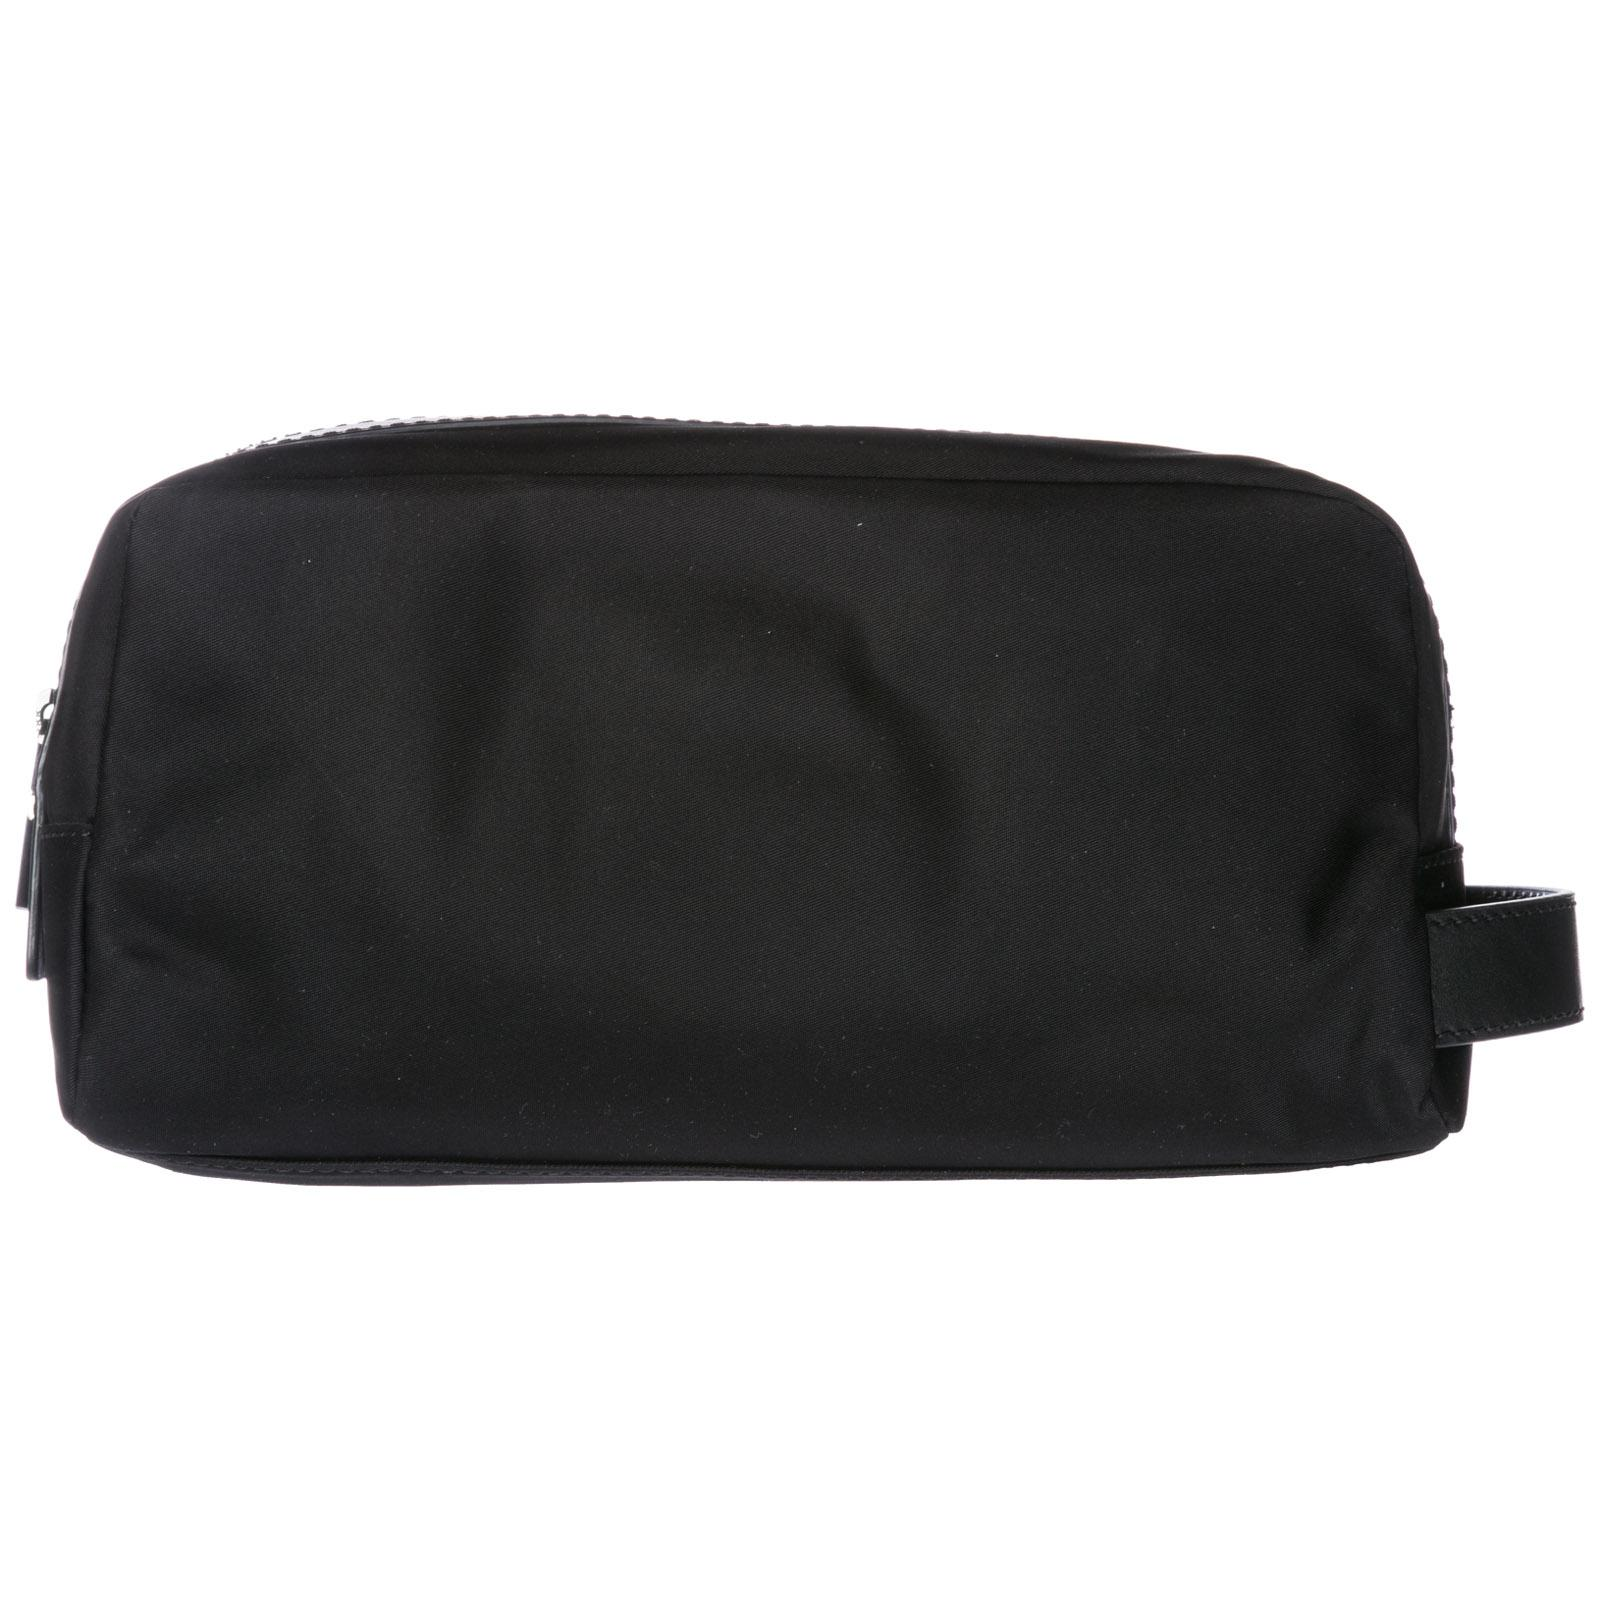 3b6a5c94ff61d1 Michael Kors Men's Travel Toiletries Beauty Case Wash Bag In Nylon Kent In  Black